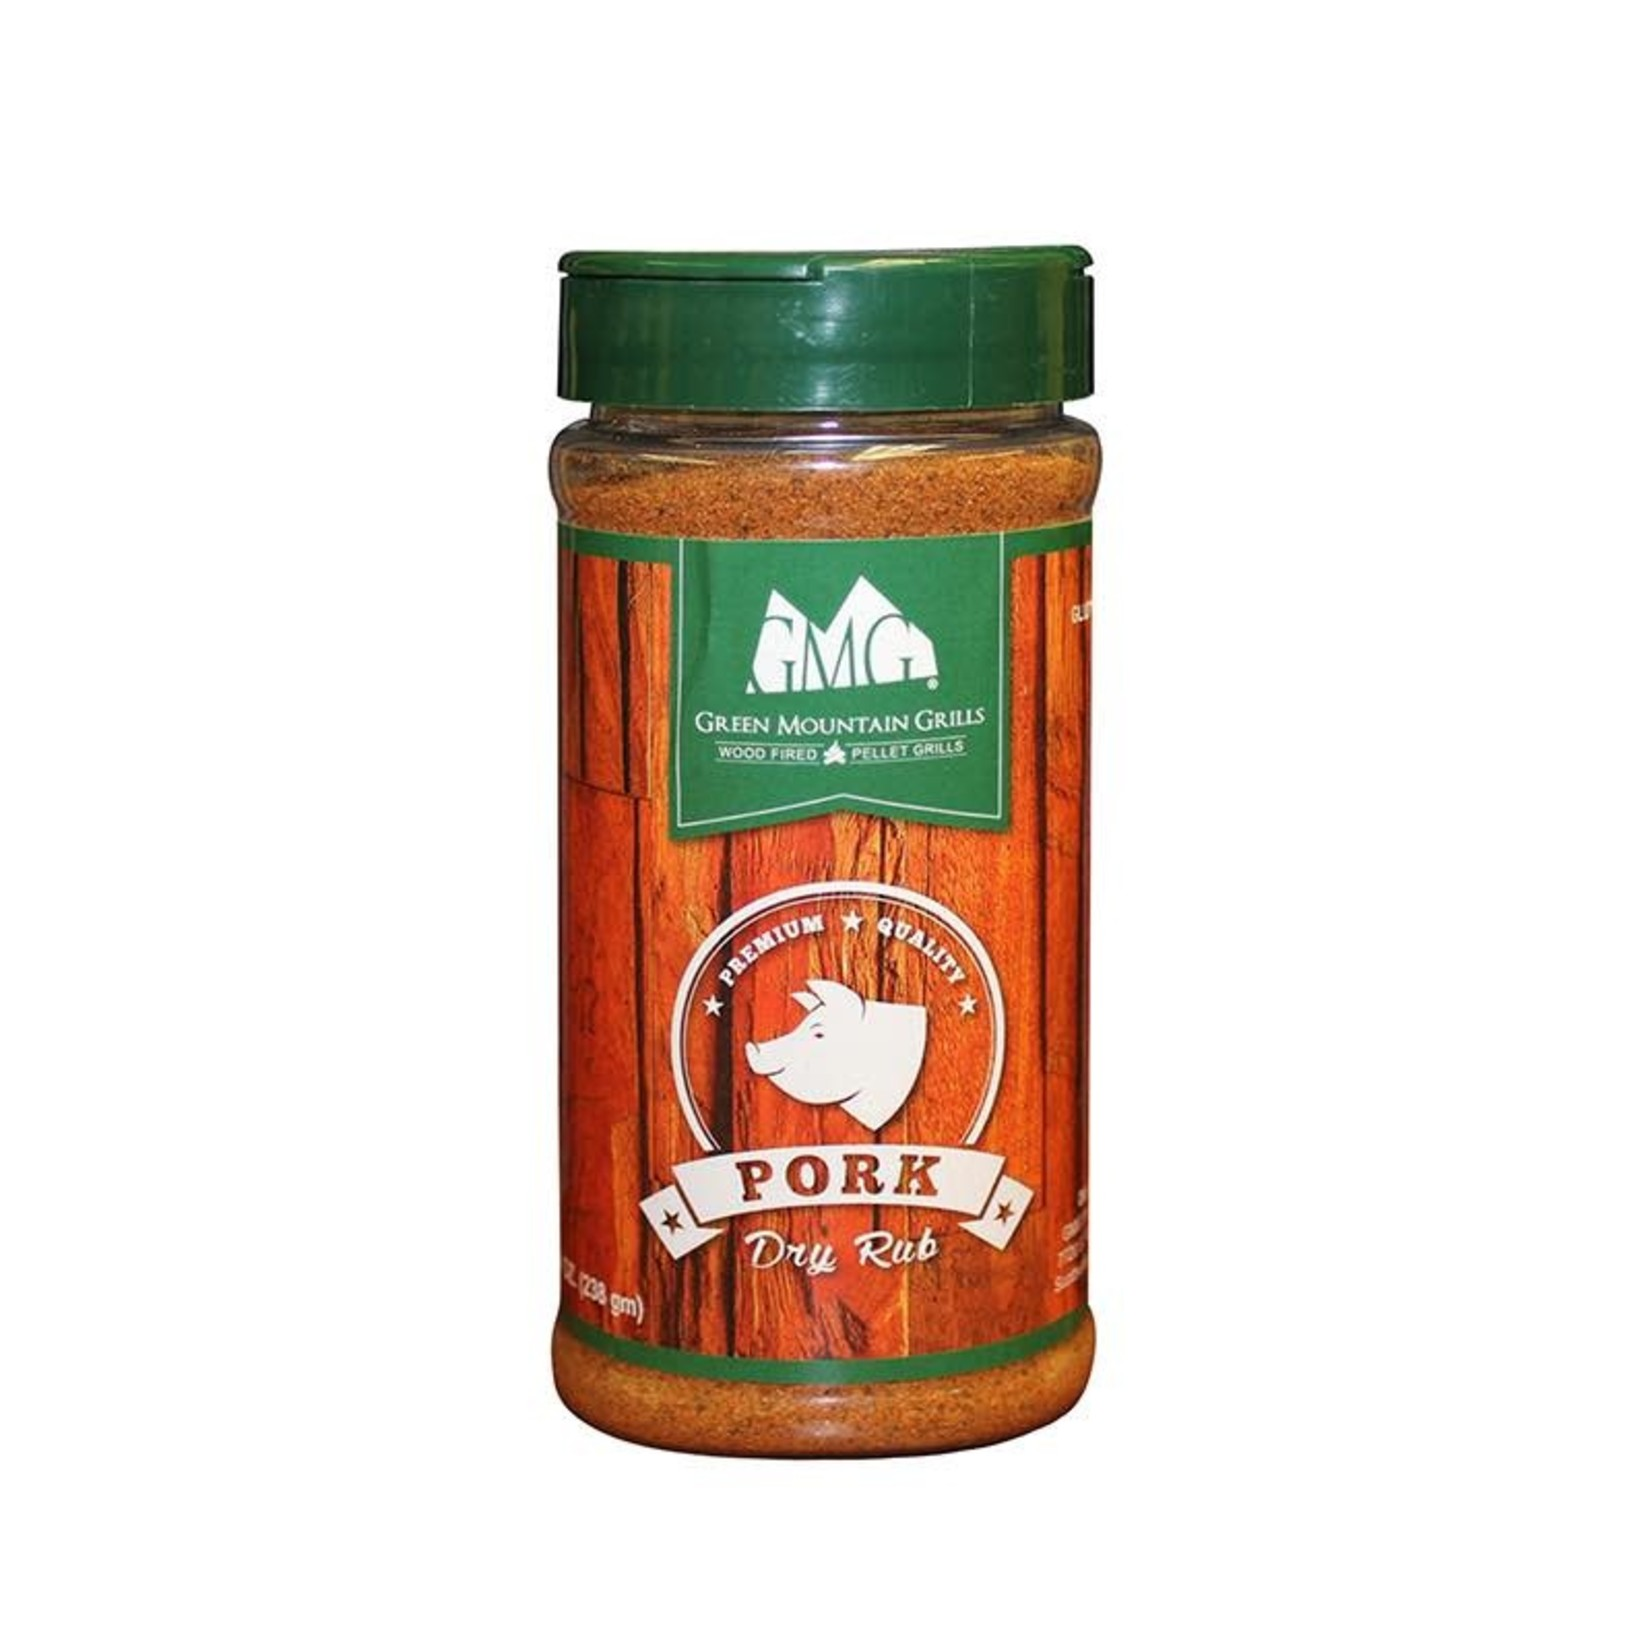 Green Mountain Grill GMG Pork Rub